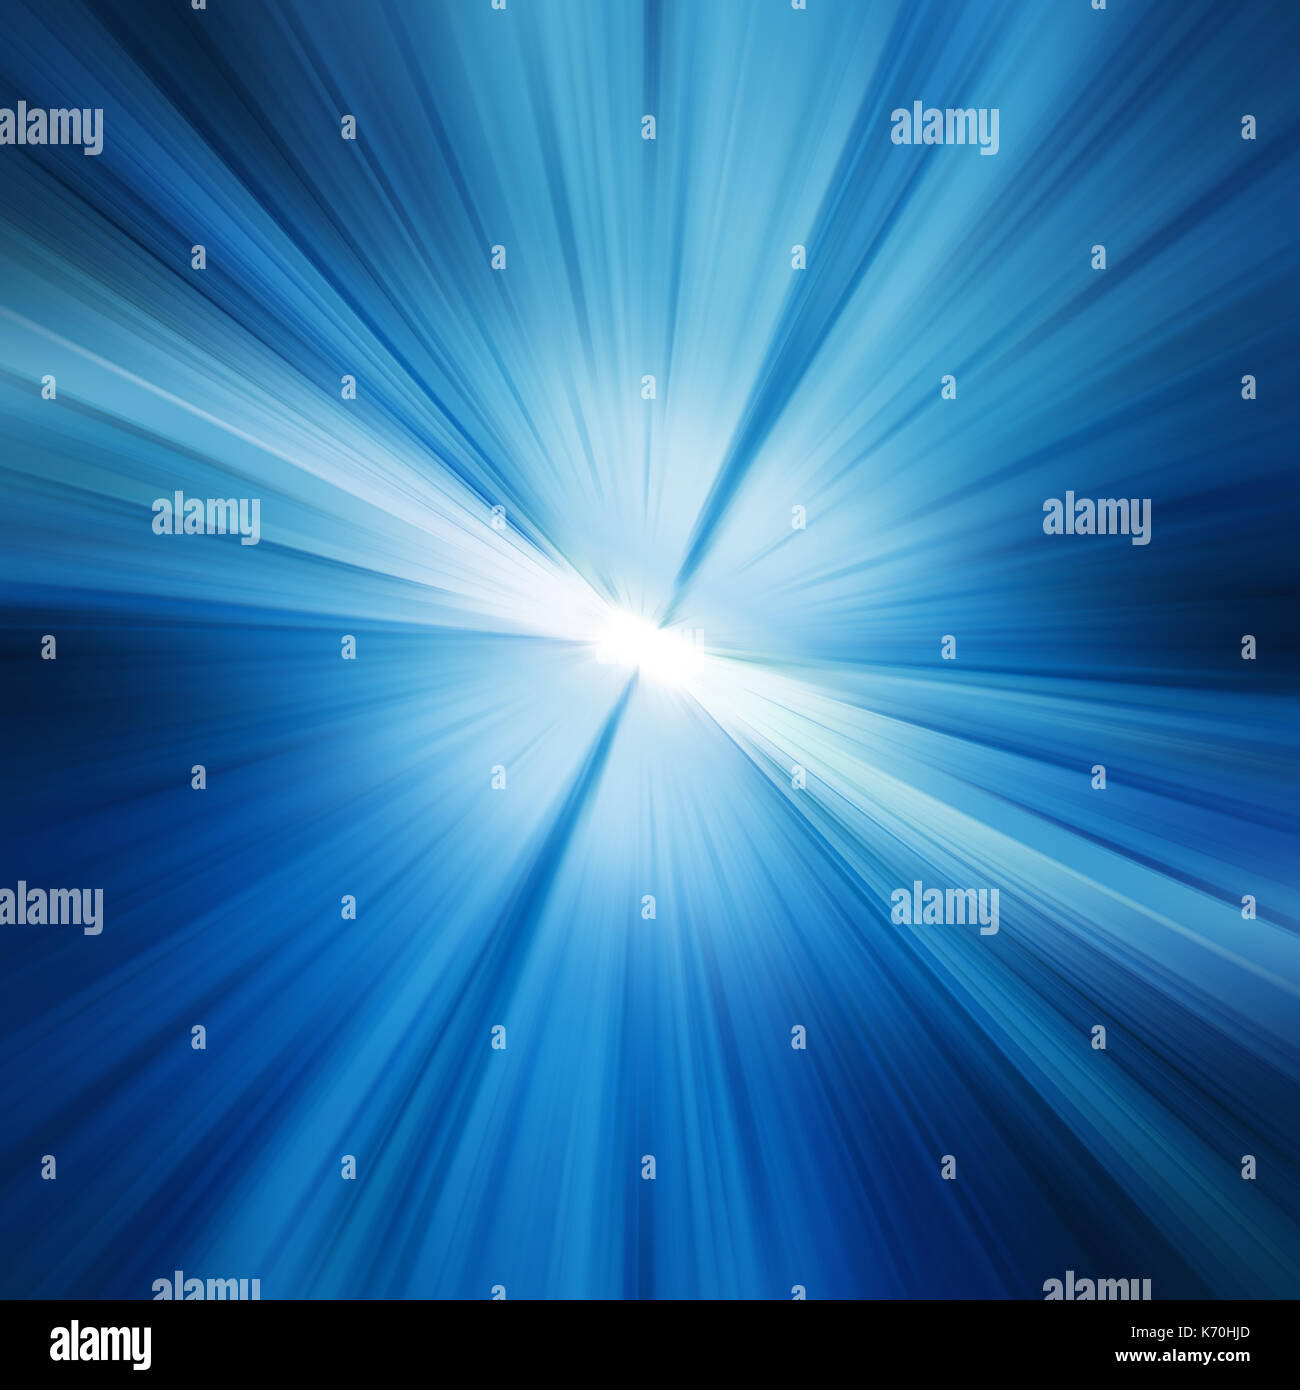 Motion blur 3d rendering - Stock Image